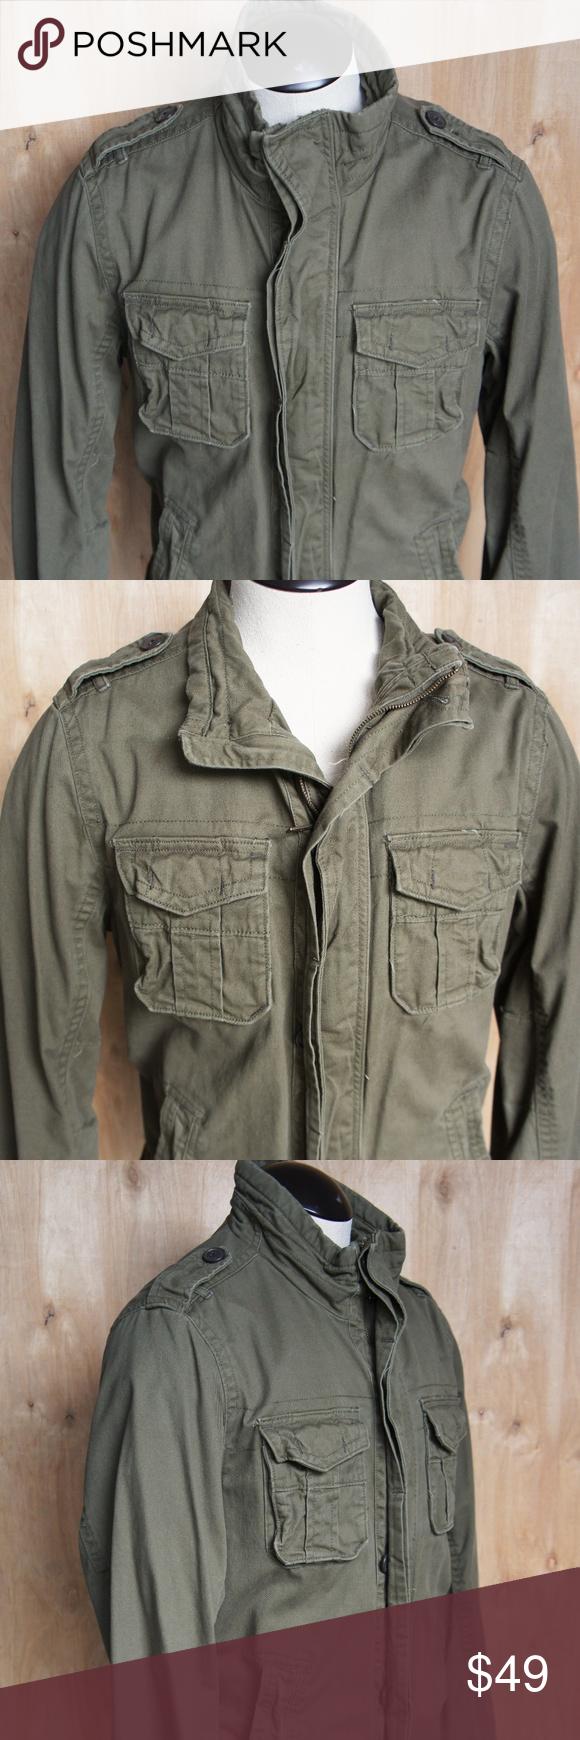 Men S English Laundry Fatigue Jacket Blaque Label Jackets English Laundry Field Jacket [ 1740 x 580 Pixel ]